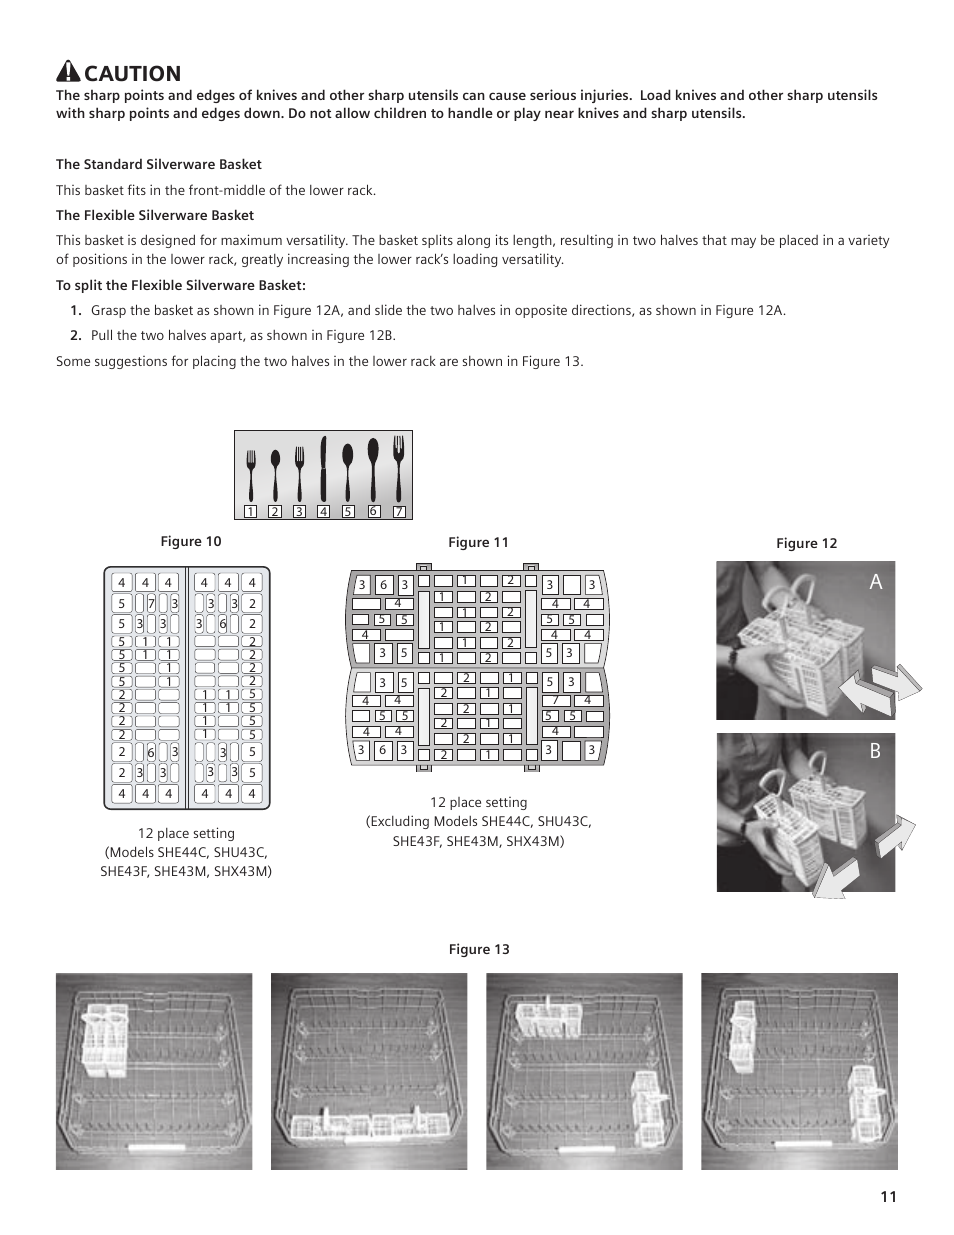 caution bosch she44c user manual page 11 22 original mode rh manualsdir com bosch shu43c service manual Bosch Dishwasher Dimensions